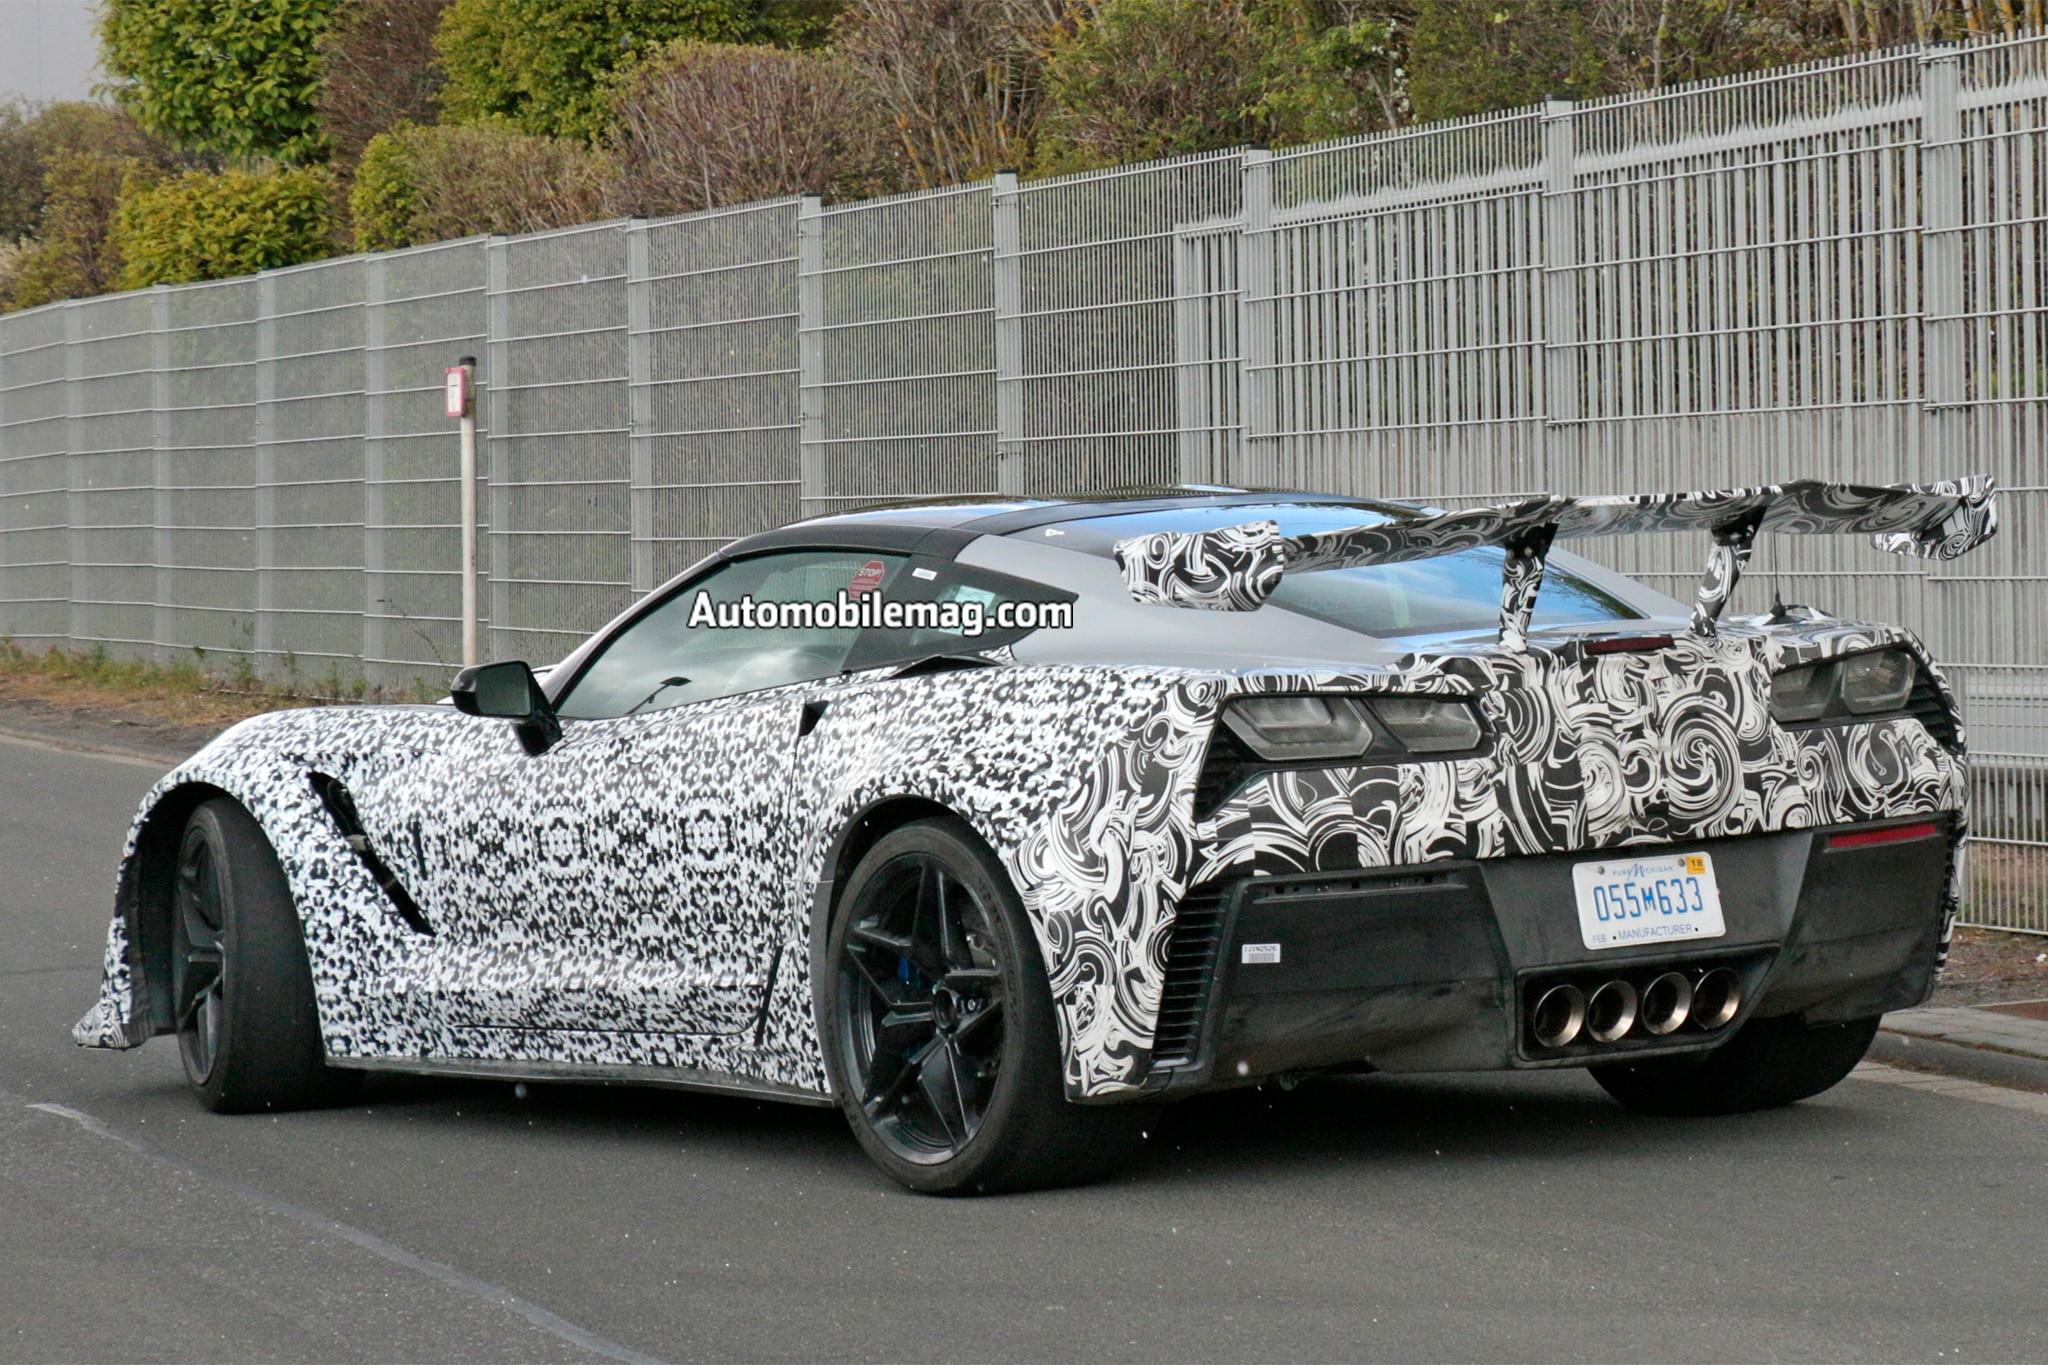 2019 Chevrolet Corvette C8 Quot Zora Quot And C7 Zr1 What To